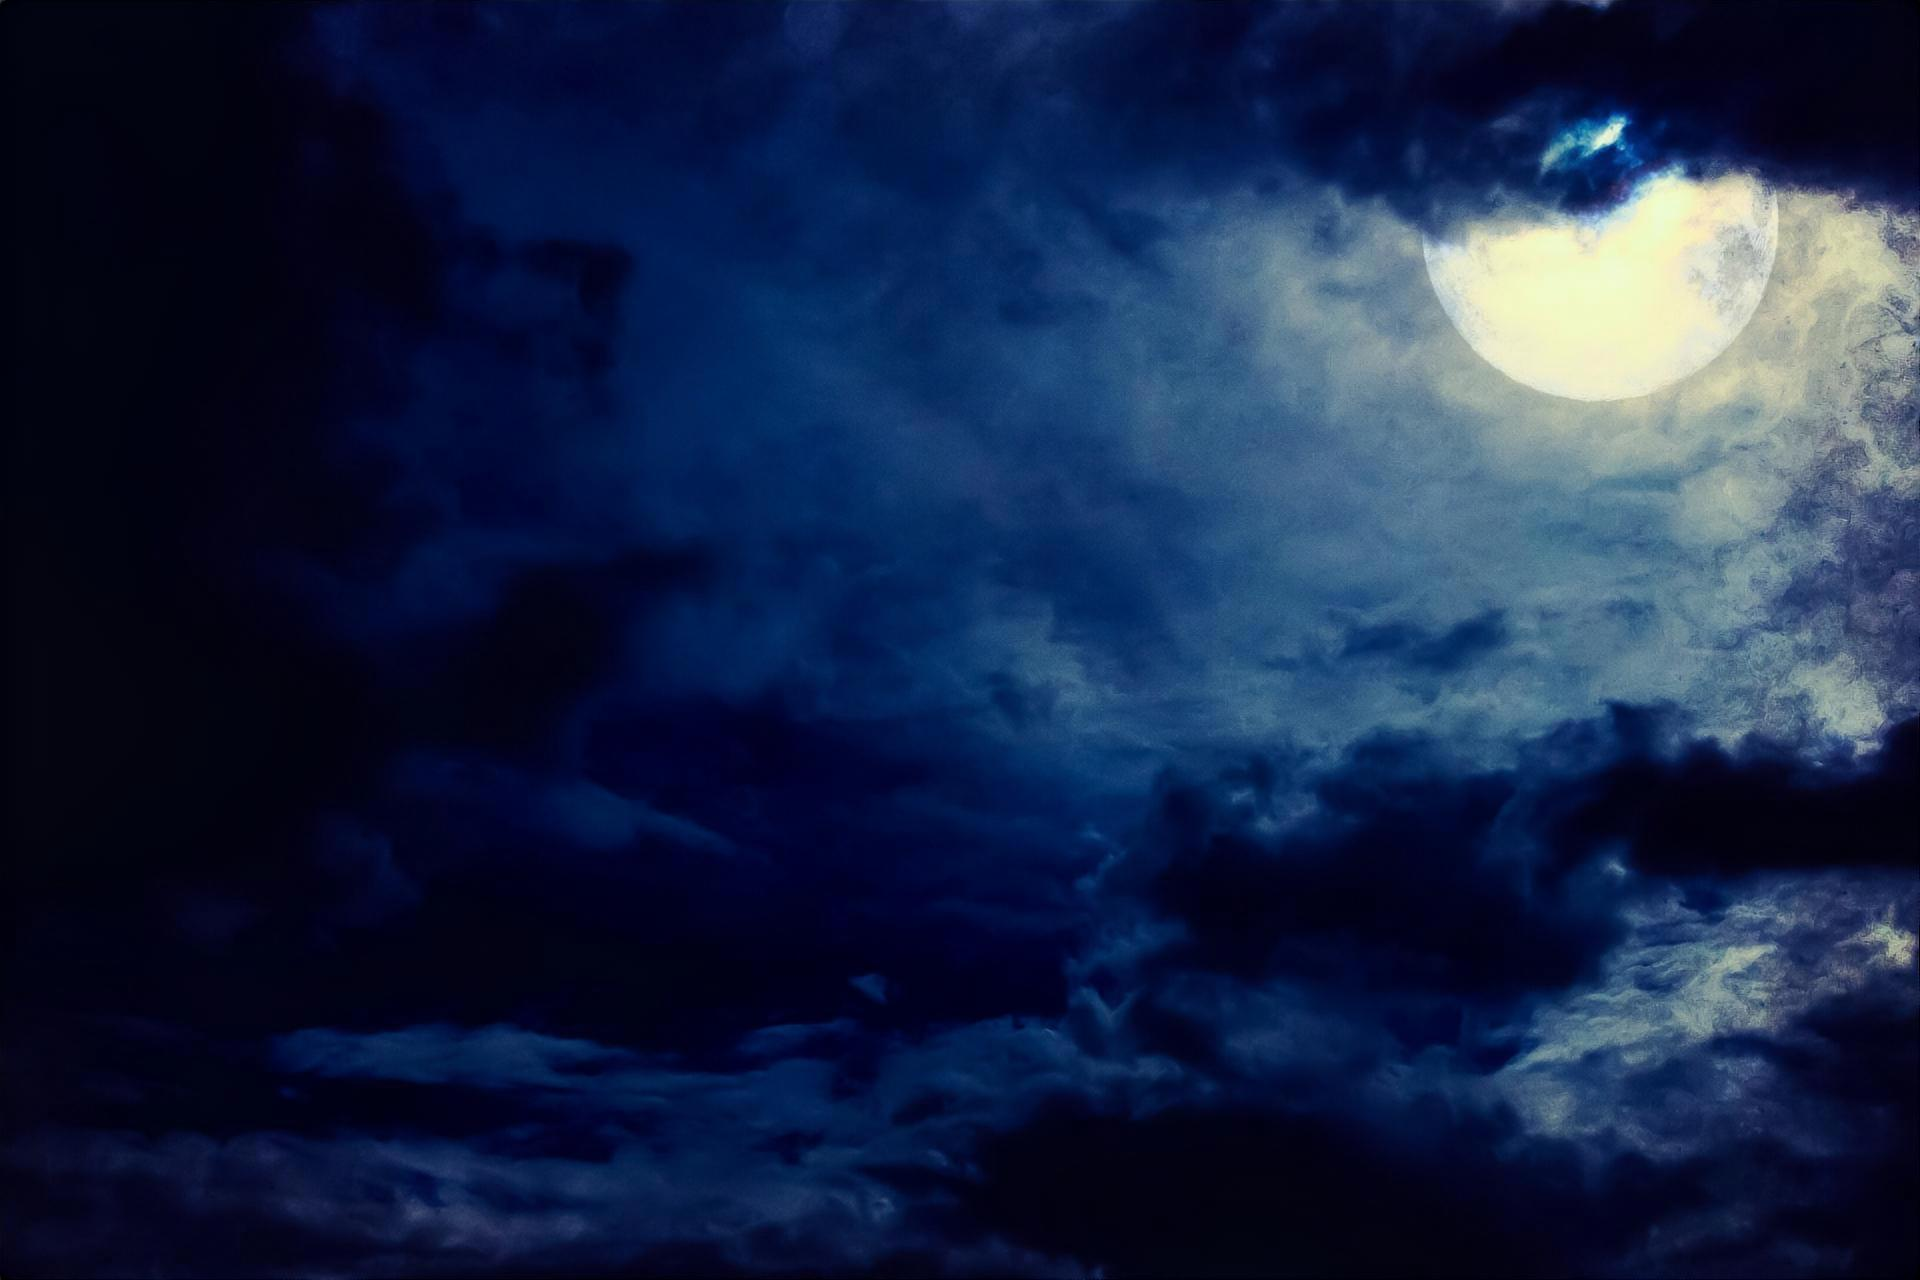 【TVアニメレビュー】鬼滅の刃 竈門炭治郎 立志編(2019)評価・感想・無料で観る方法